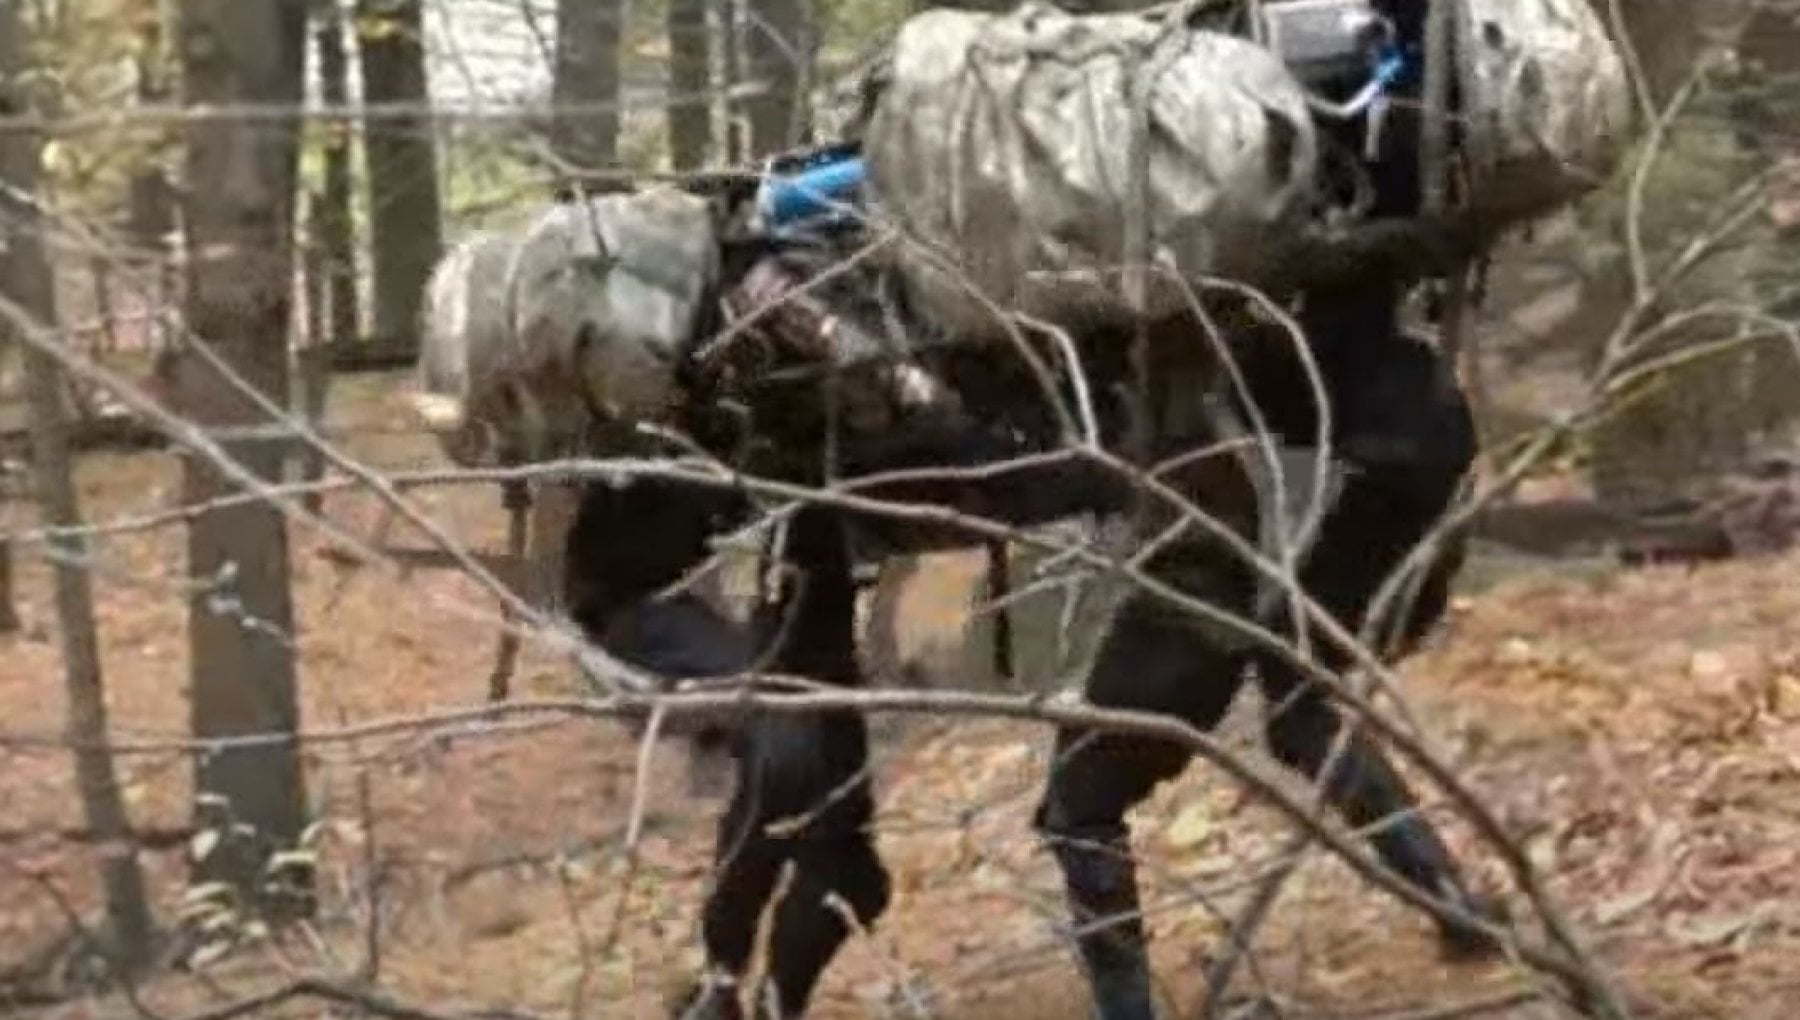 205711763 b770bc07 4e31 4145 bb49 91cdd18bb60c - Forze Armate, dopo quasi 20 anni tornano i muli: in versione robot o in carne e ossa